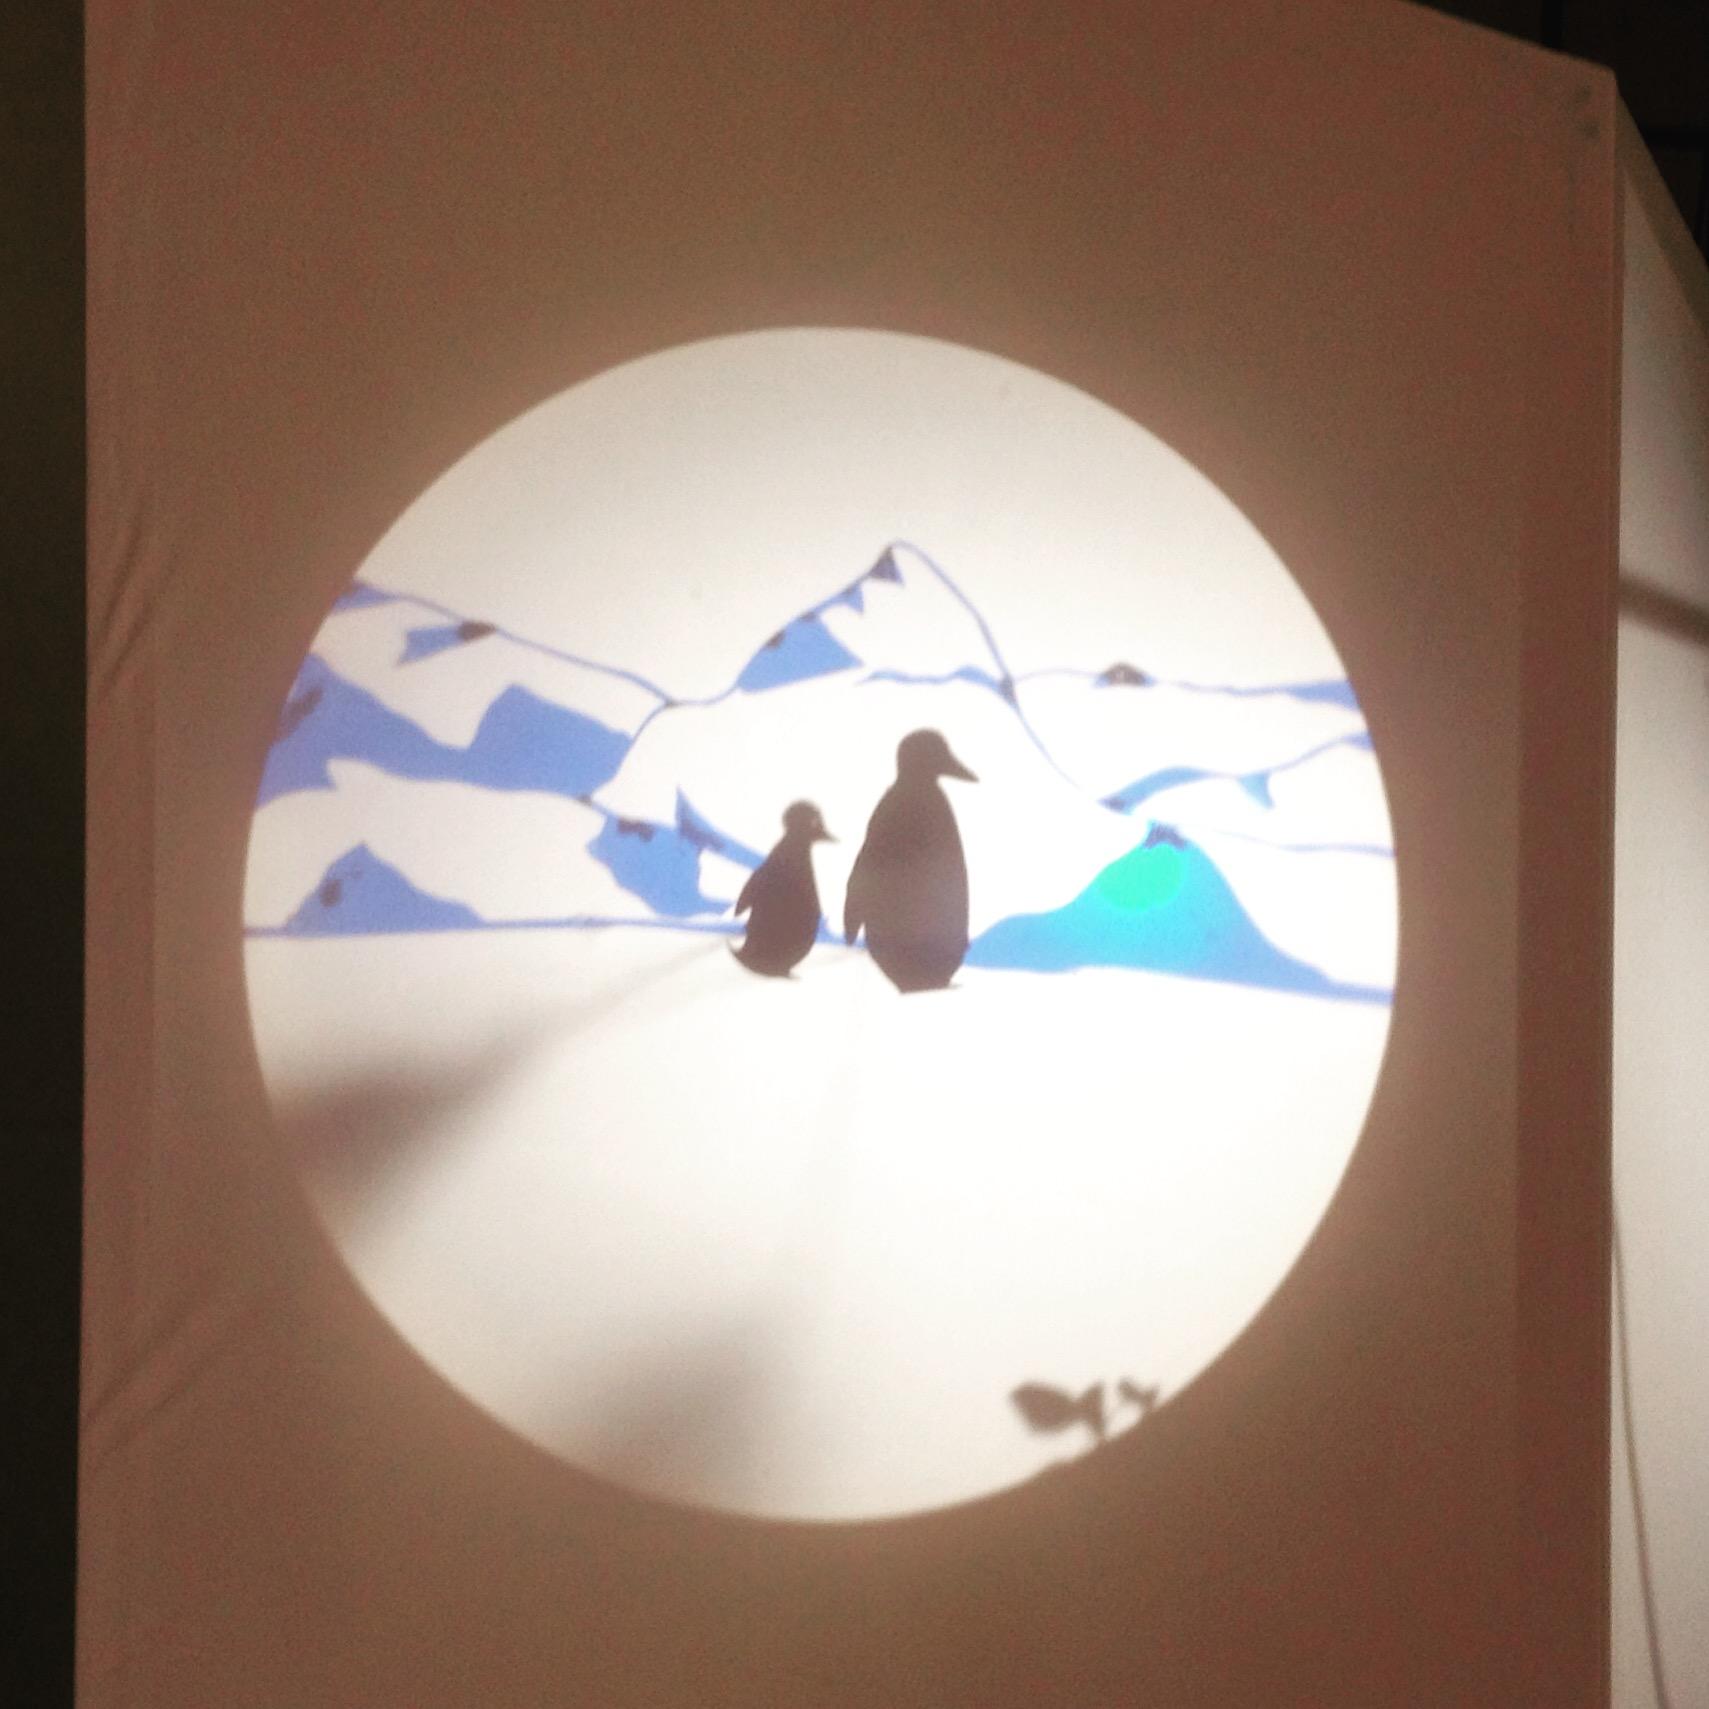 The penguin's story